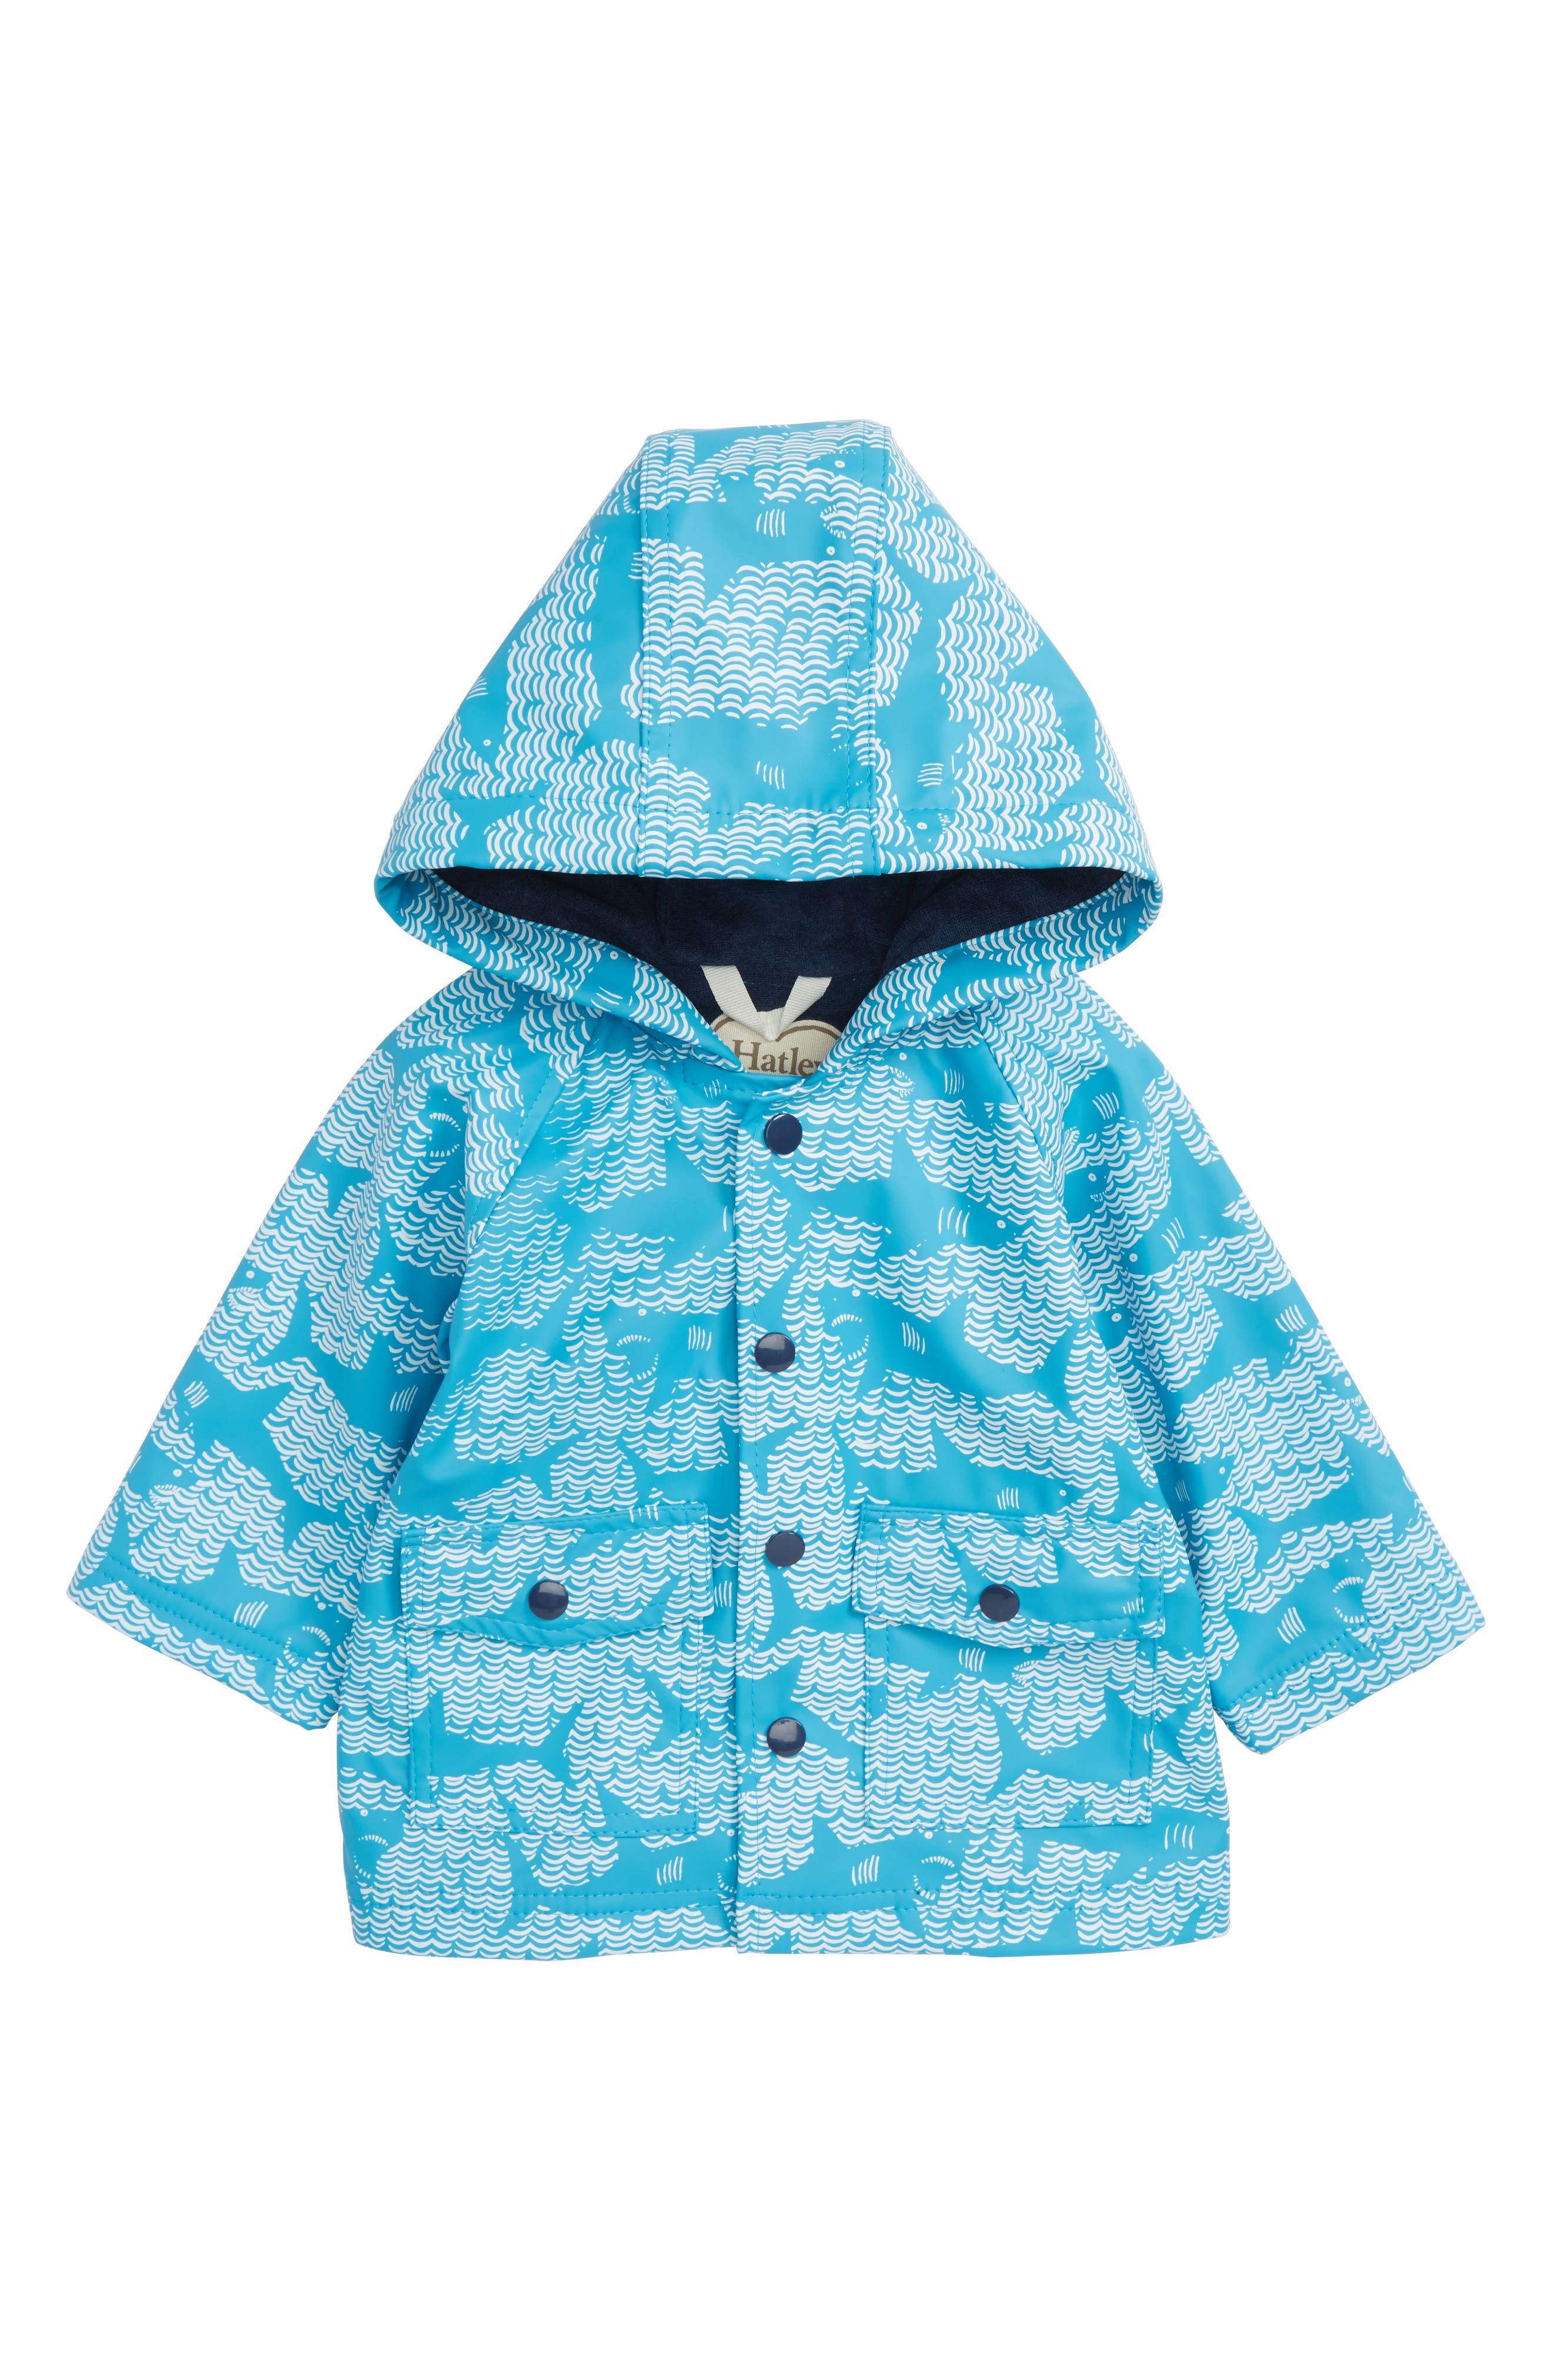 Shark Alley Hooded Raincoat,                         Main,                         color, 400